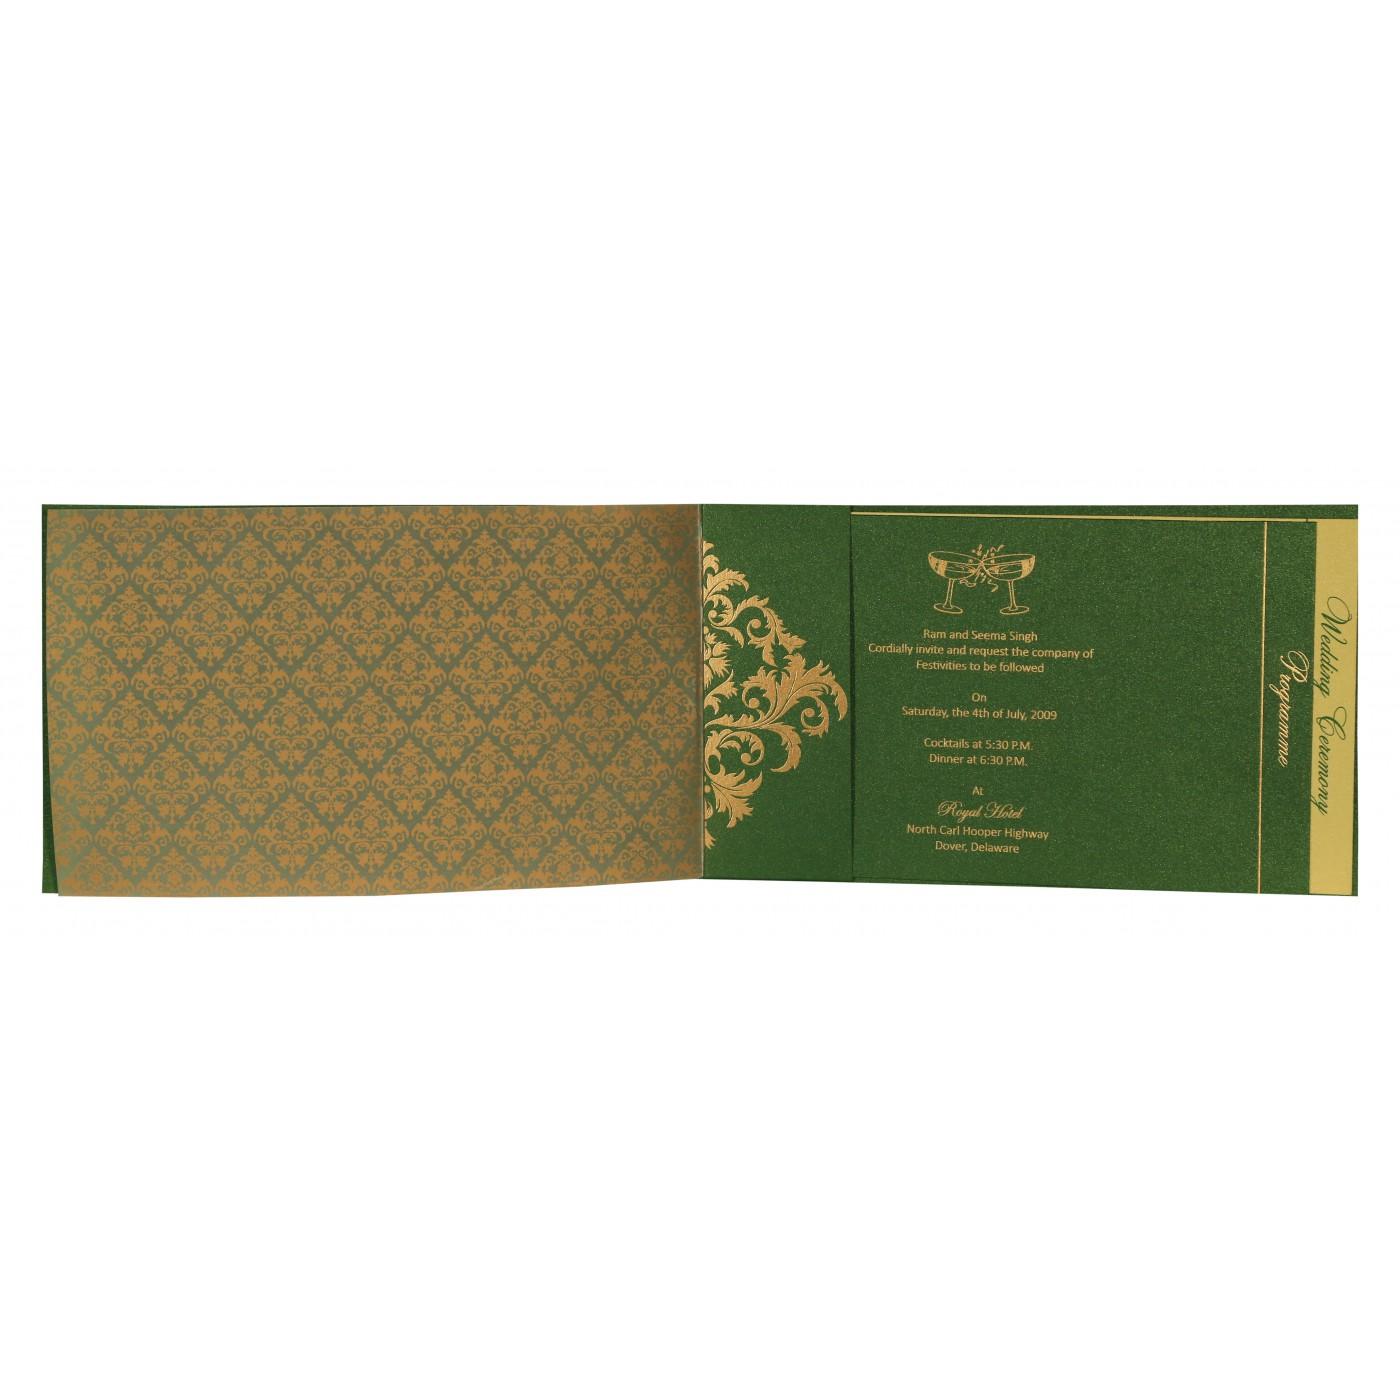 DARK GREEN SHIMMERY DAMASK THEMED - SCREEN PRINTED WEDDING CARD : C ...